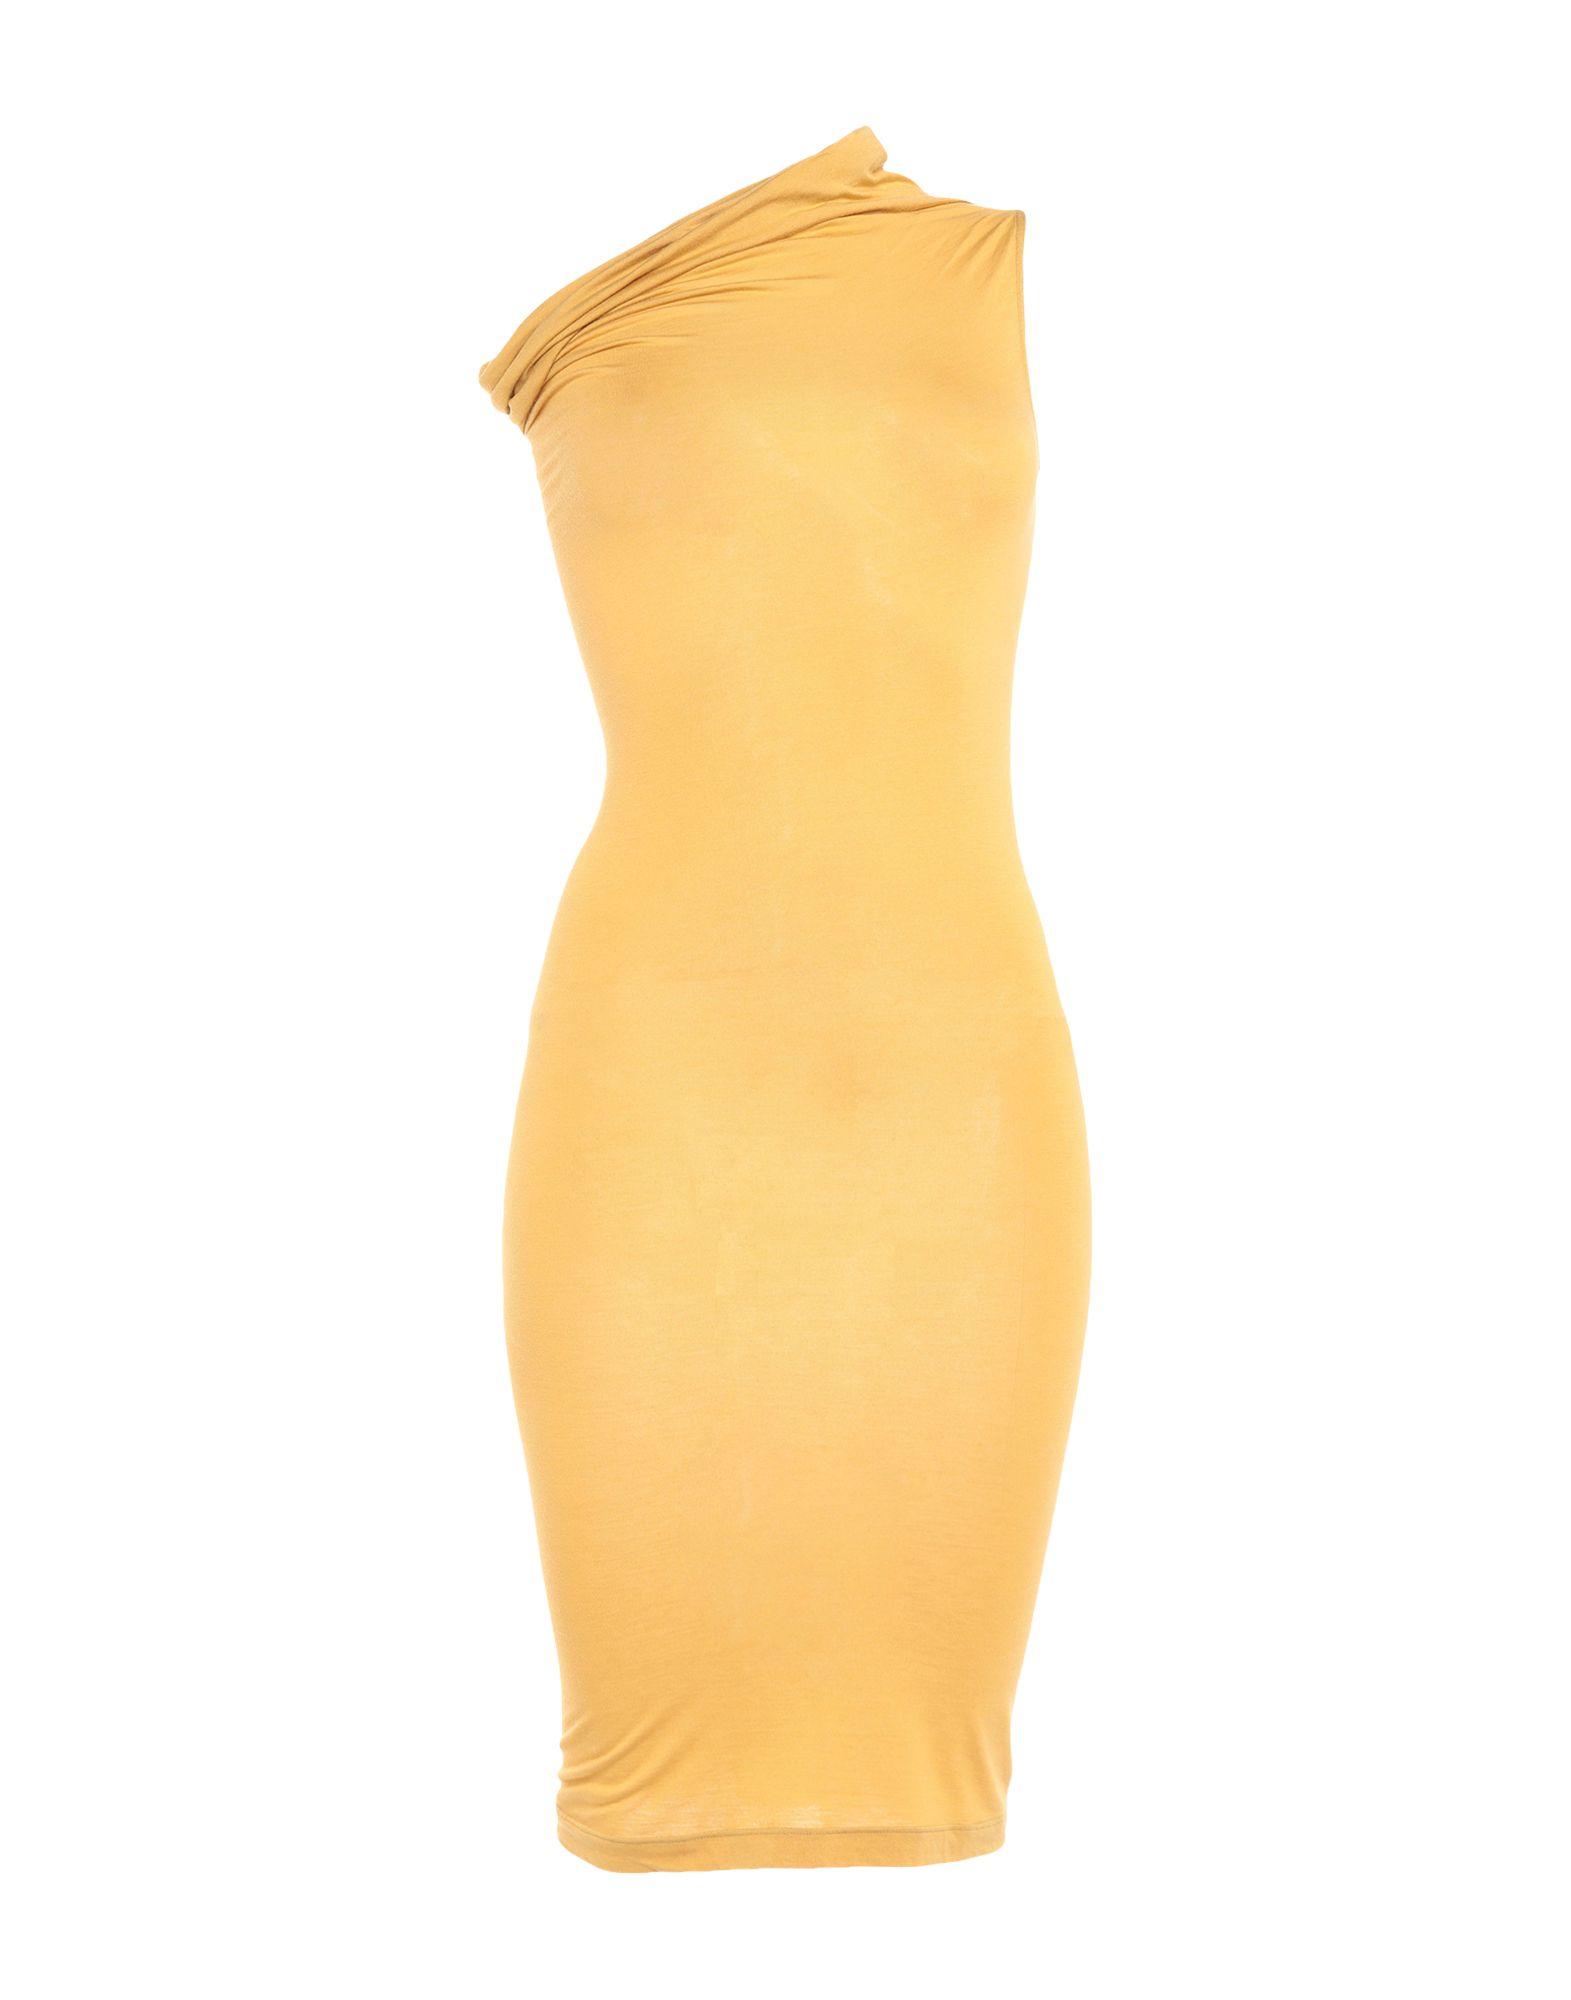 Фото - RICK OWENS LILIES Короткое платье rick owens lilies длинное платье